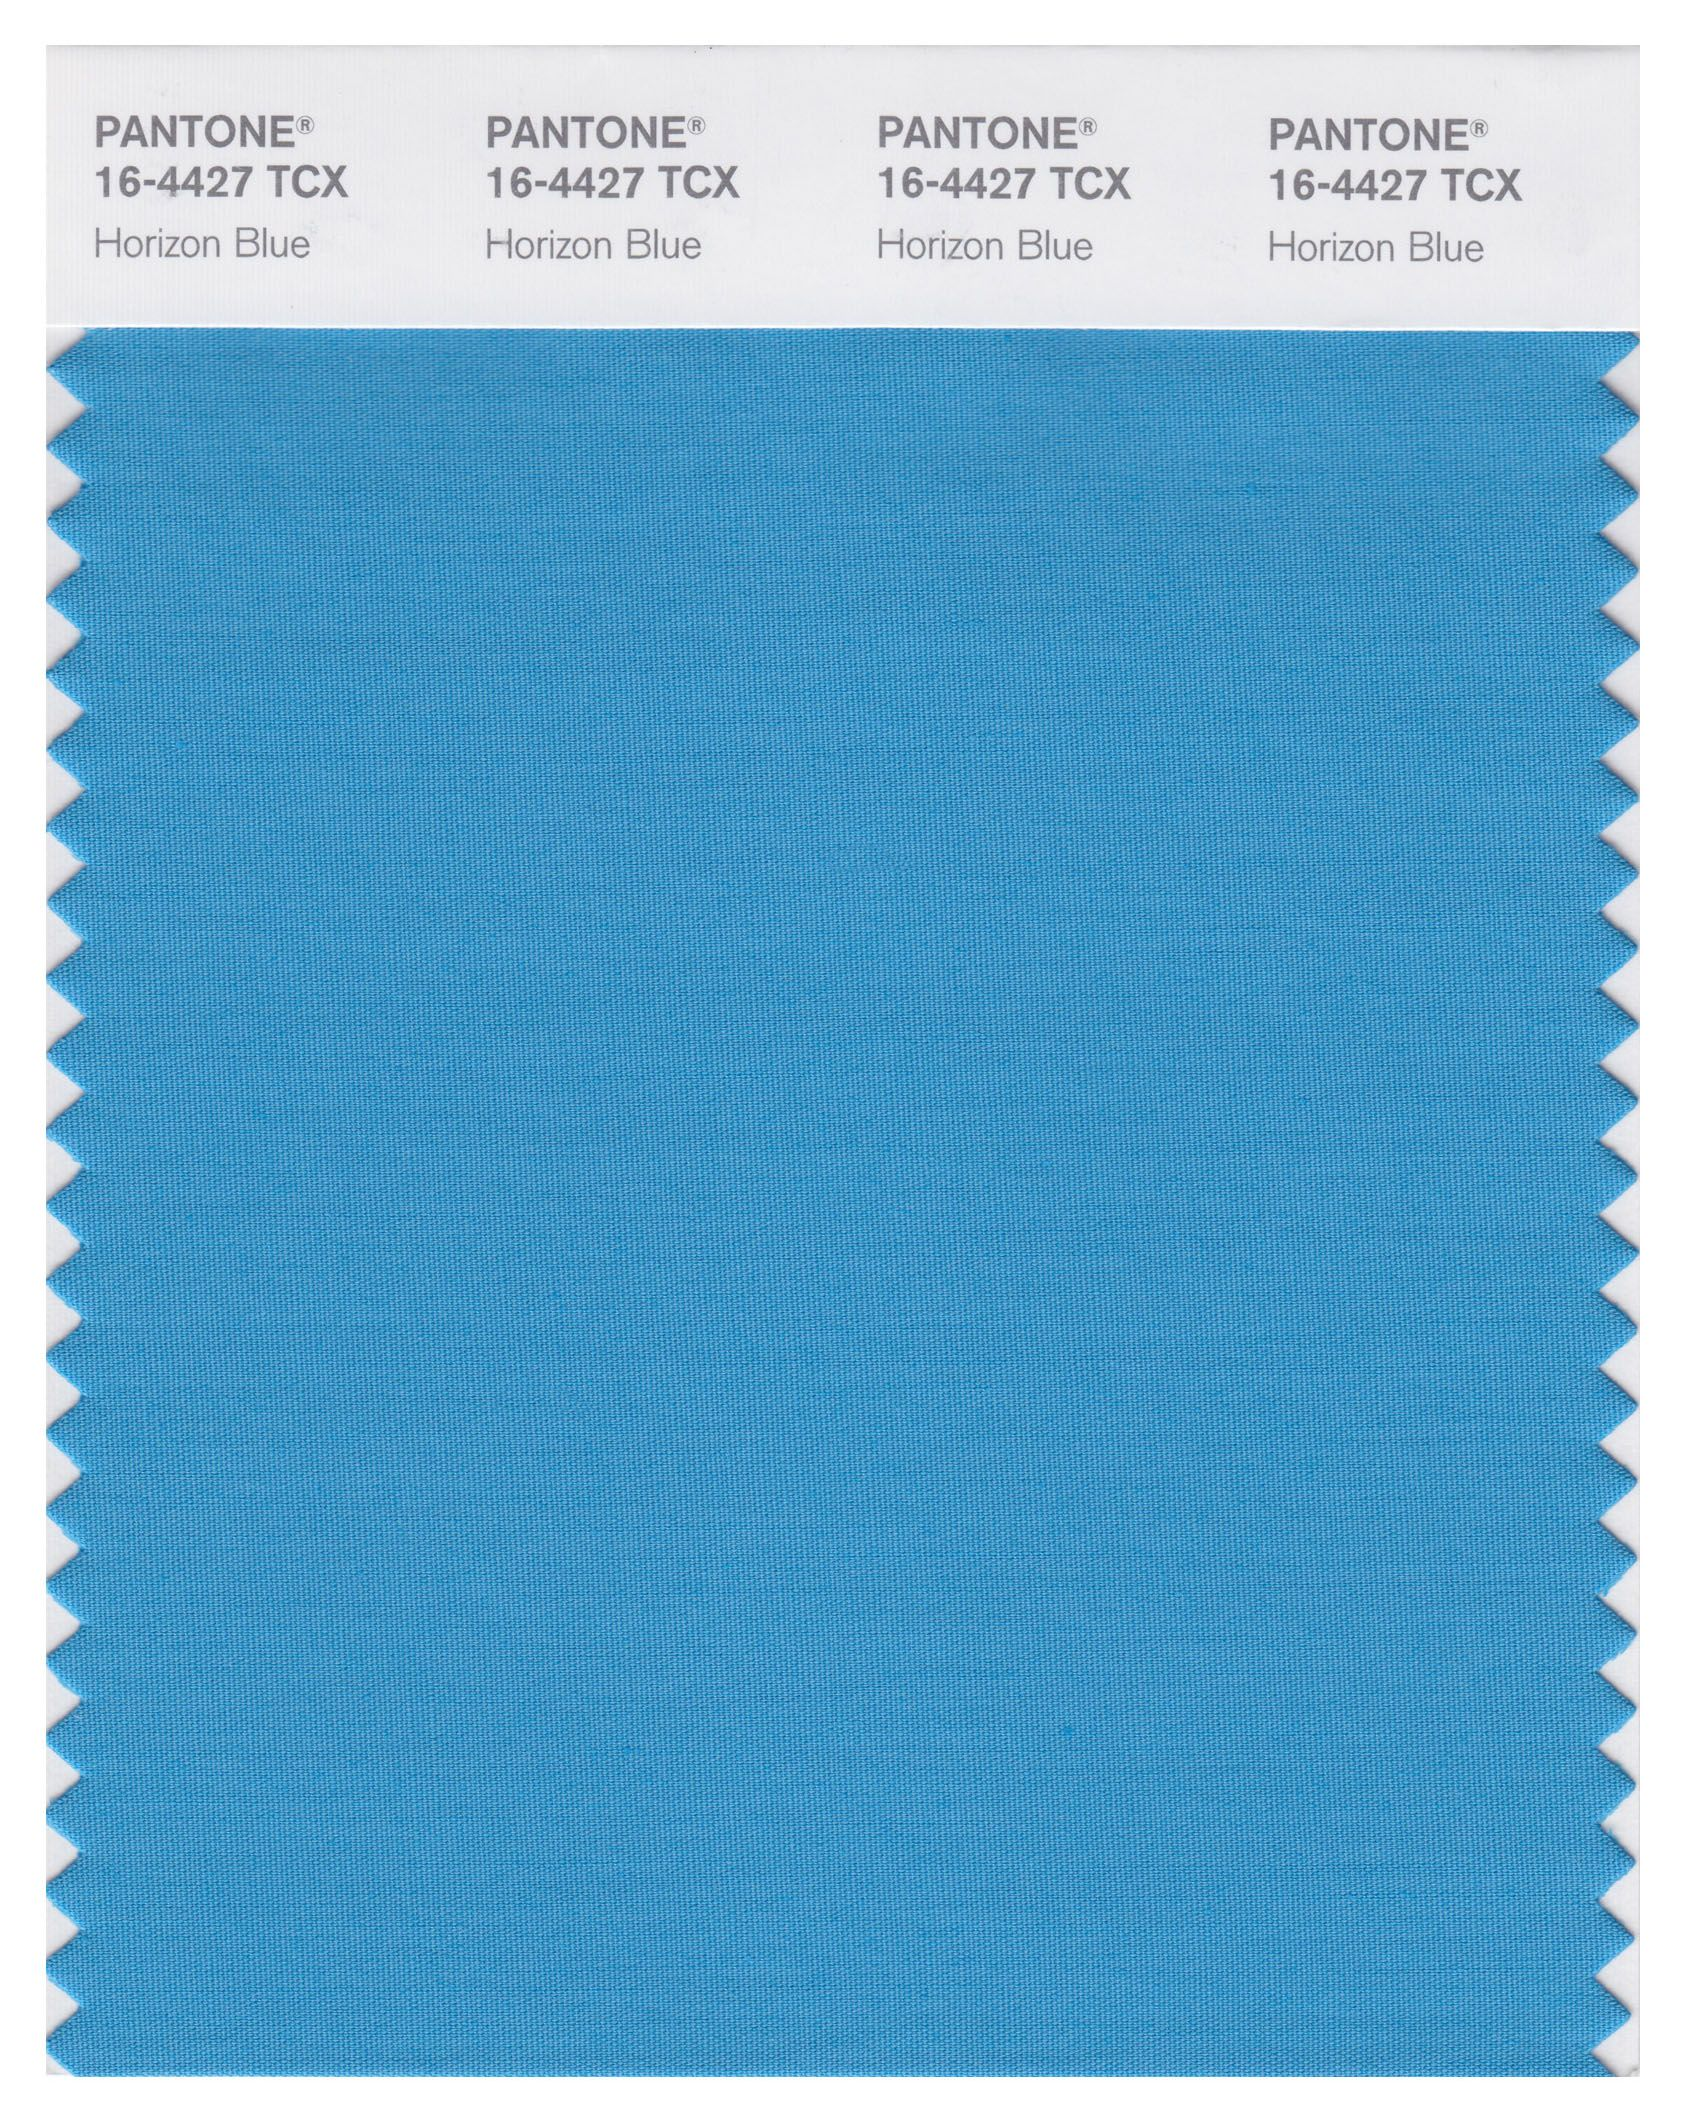 pantone smart 16-4427 tcx color swatch card | horizon blue